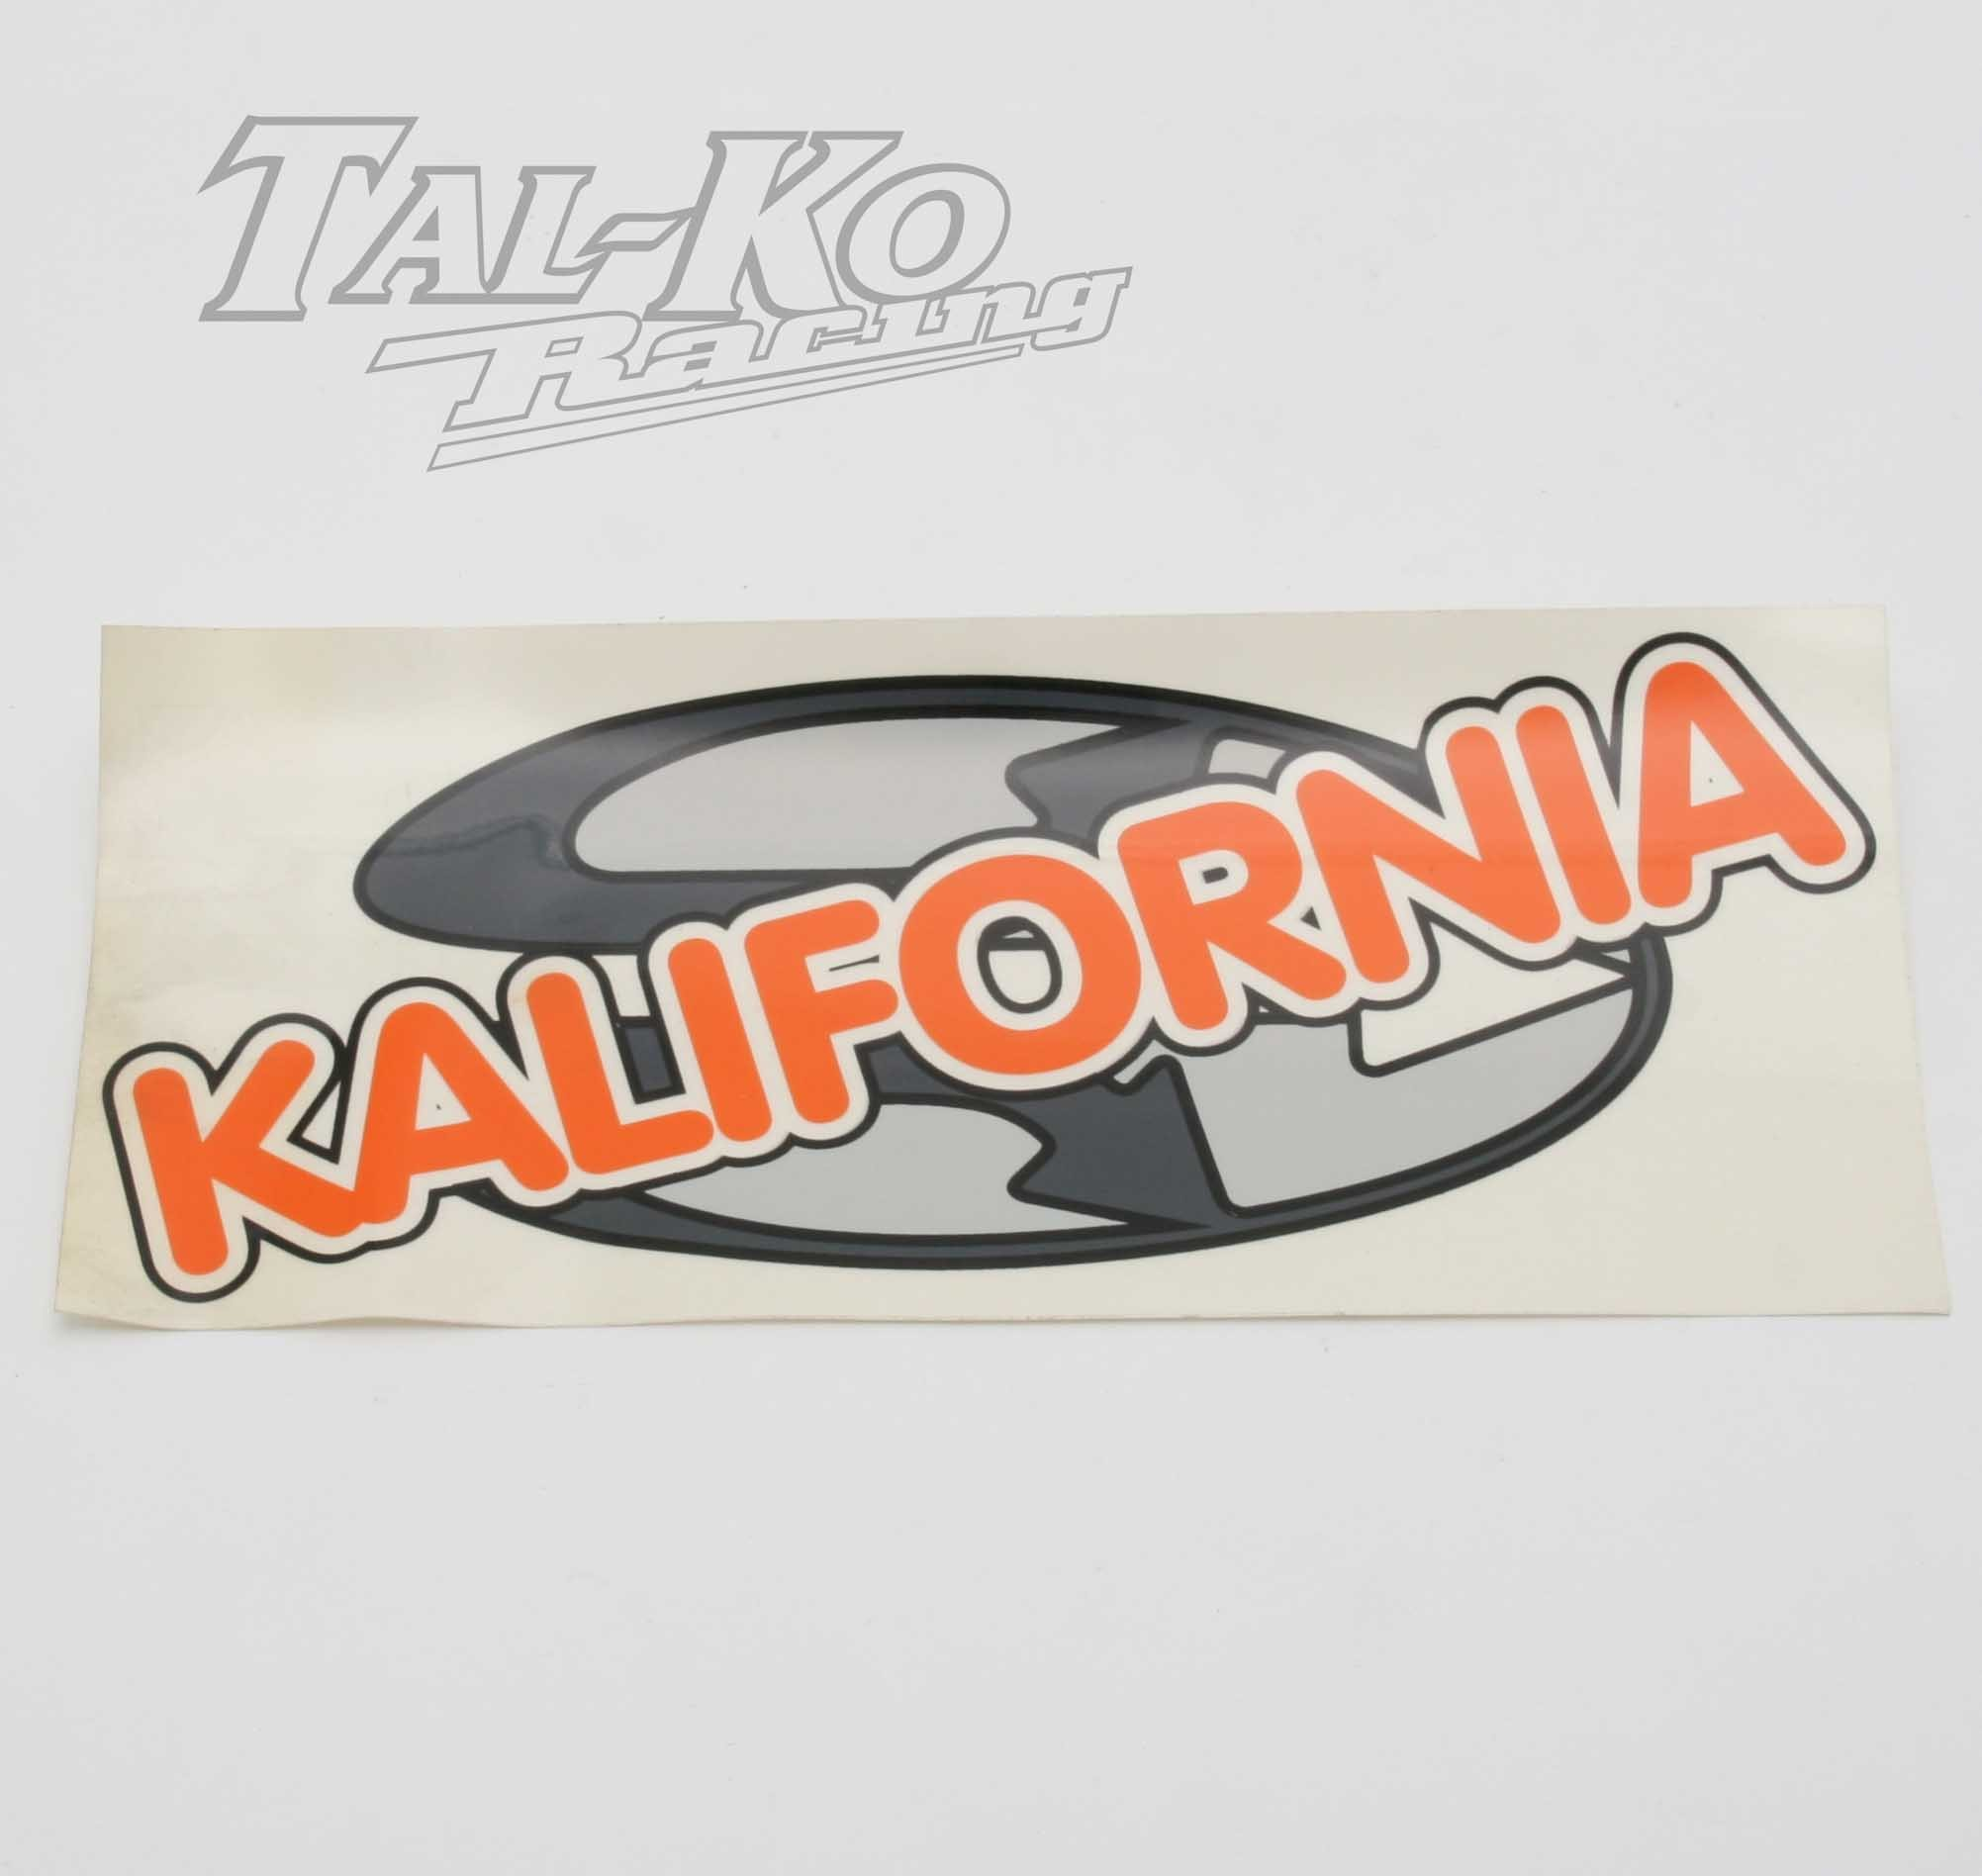 CRG KALIFORNIA STICKER DECAL 230 x 100